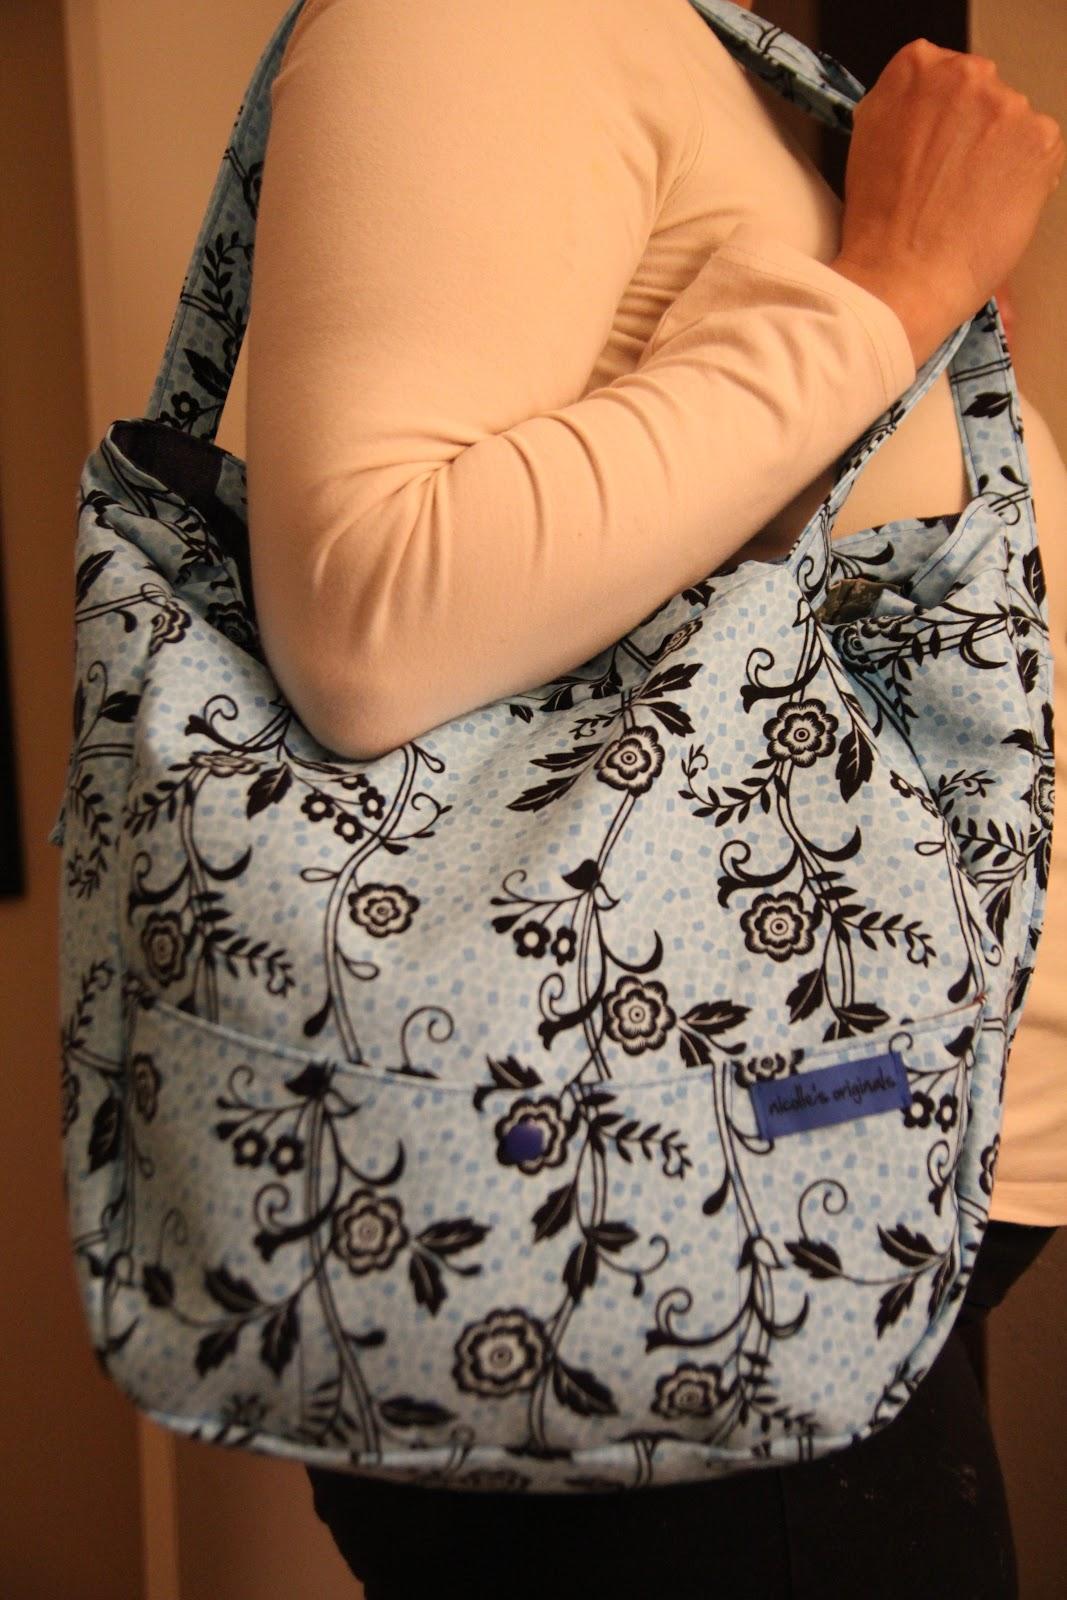 nicolle 39 s originals tutorial convertible tote and backpack or diaper bag free diaper bag pattern. Black Bedroom Furniture Sets. Home Design Ideas